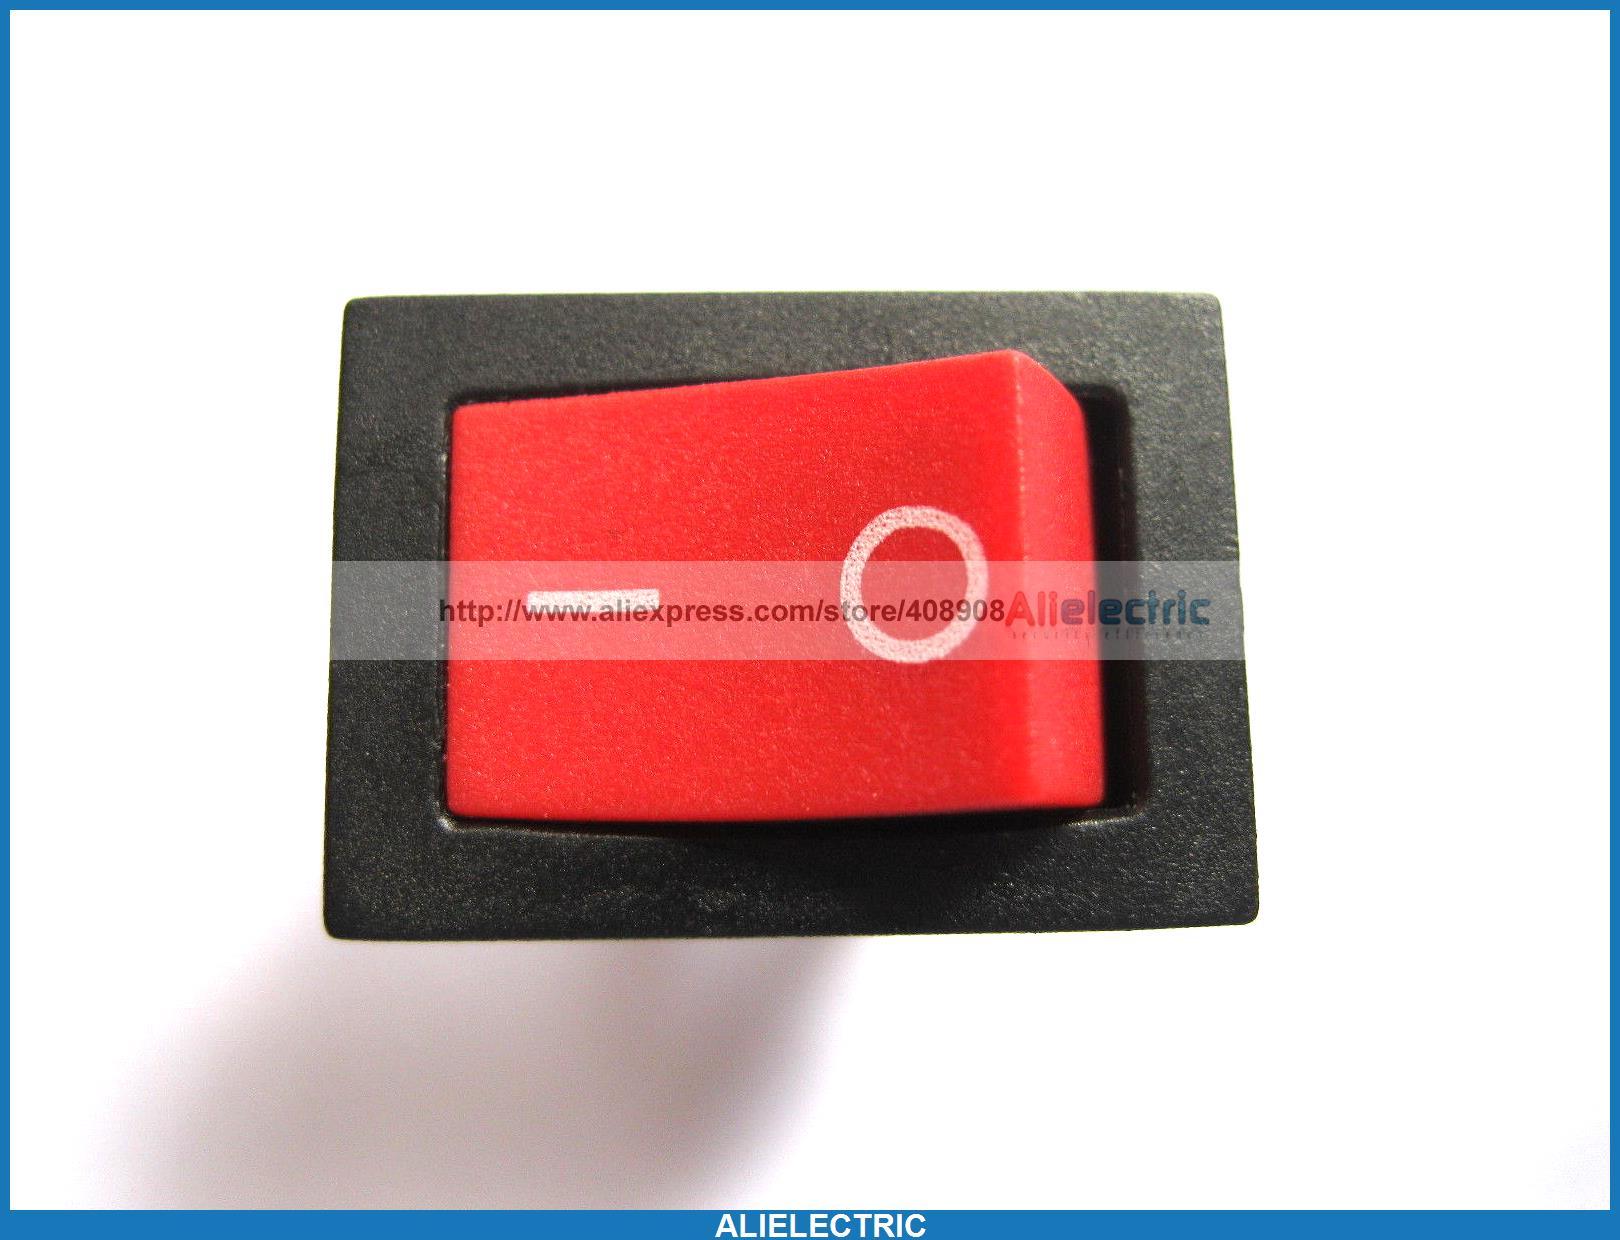 200 Pcs Rocker Switch KCD1 on Off Red Cap 2pin 6A 10A 21x15mm<br><br>Aliexpress